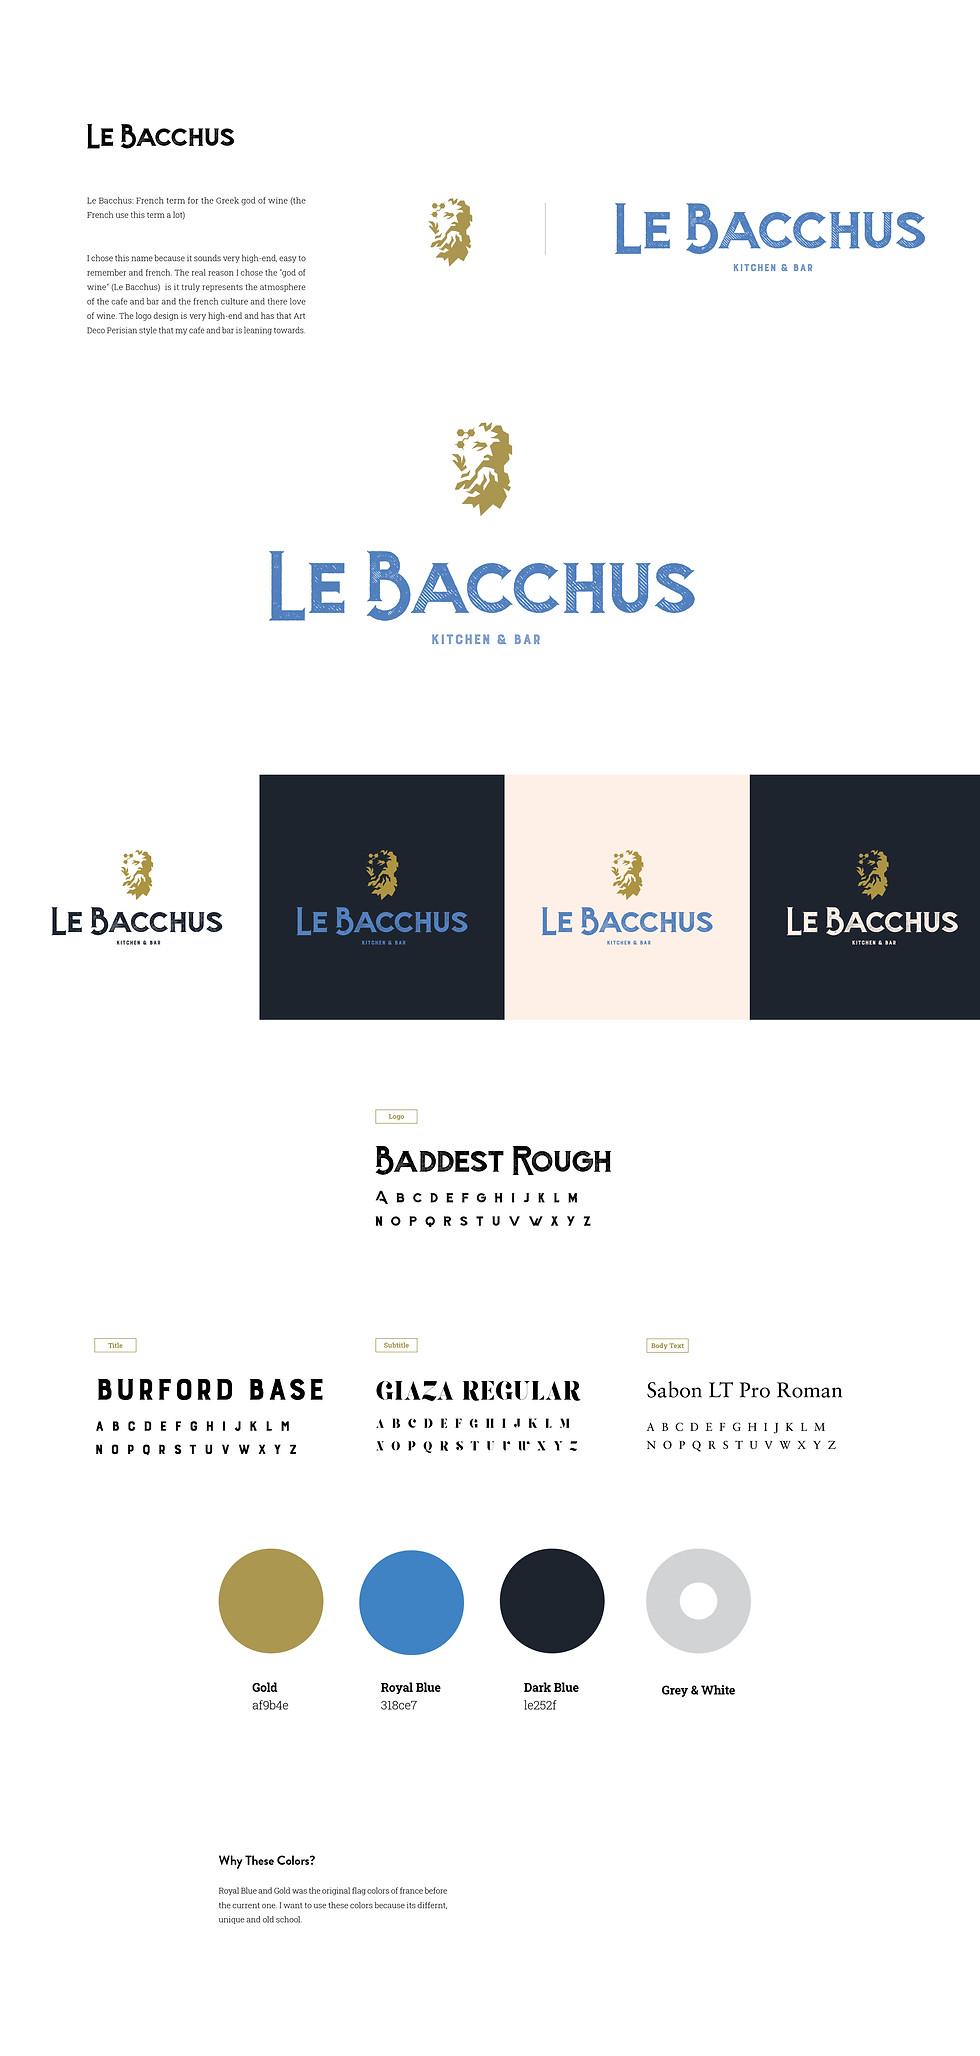 LeBacchus_BehanceLayout_C.jpg